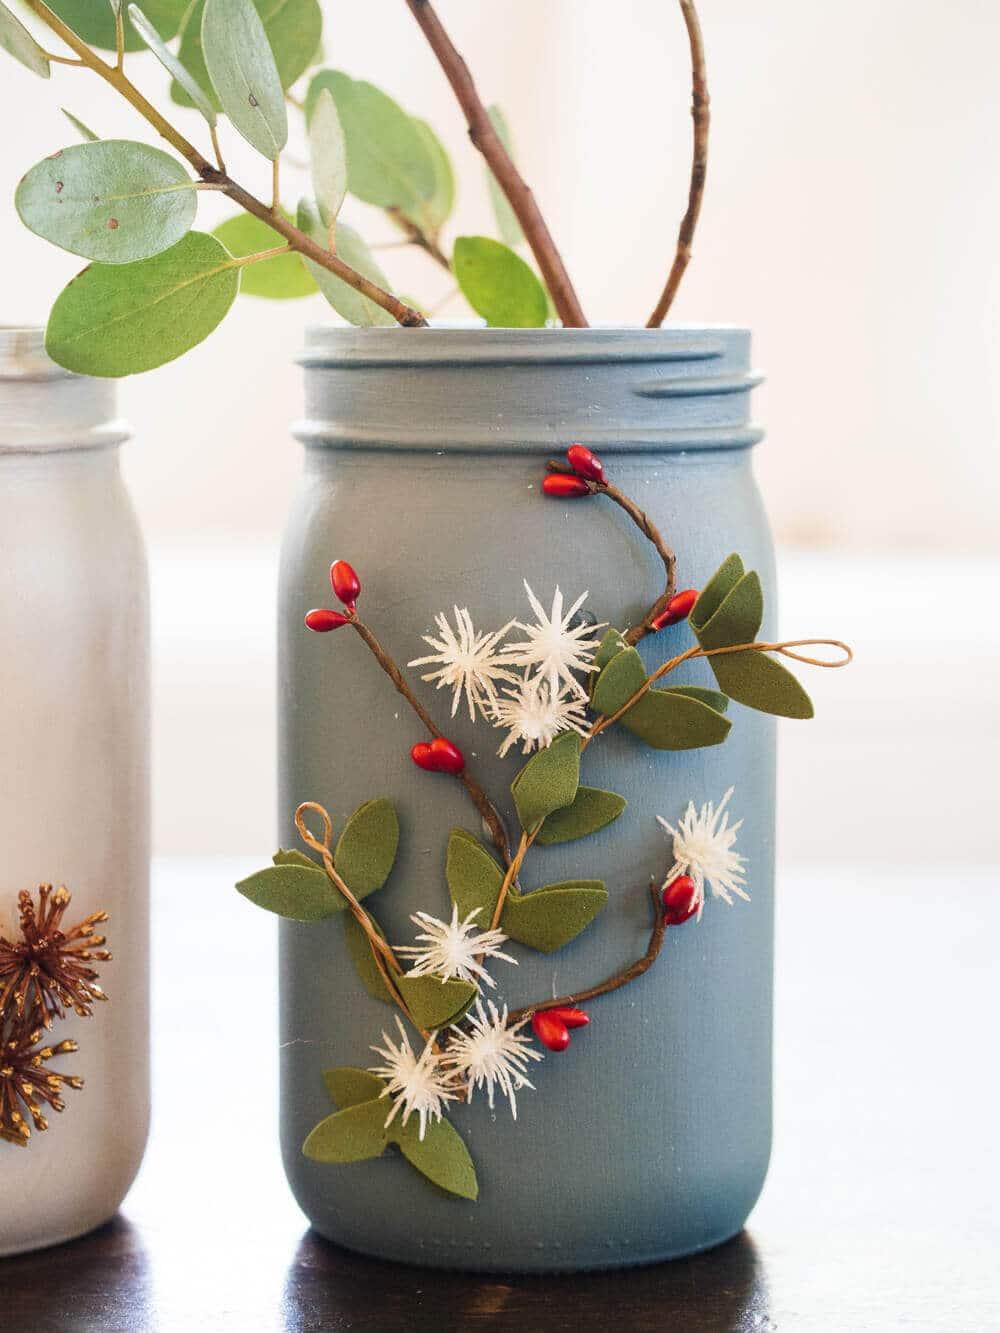 Festive decorations on mason jars